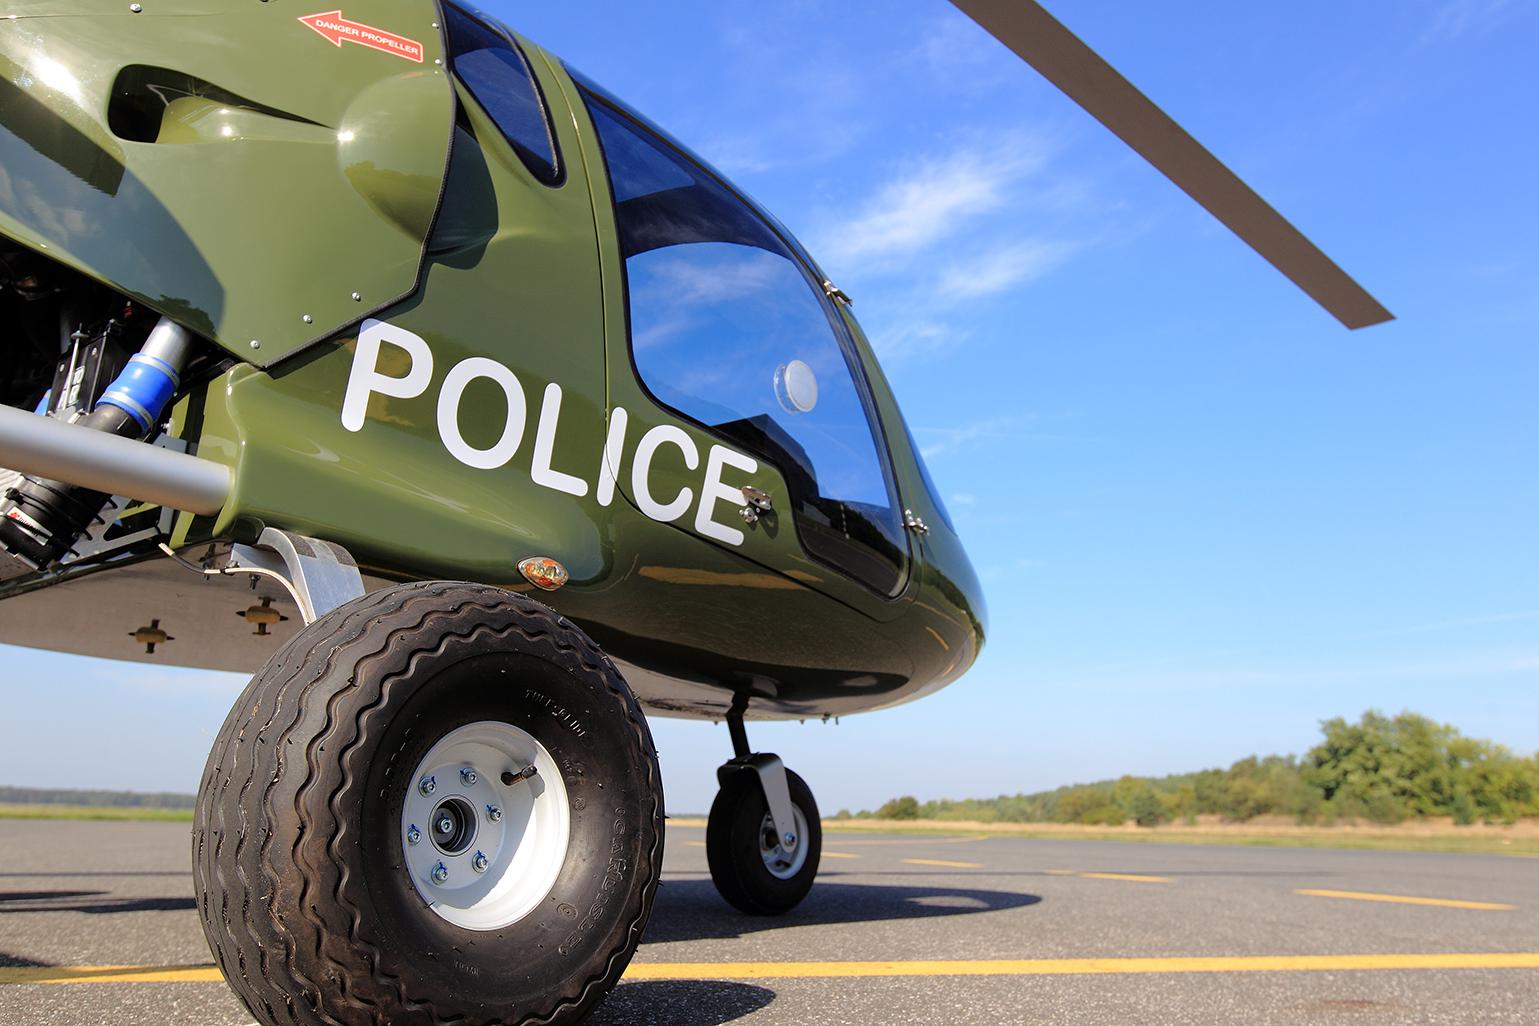 Taurus biggest 3 seater gyroplane, gyrocopter as